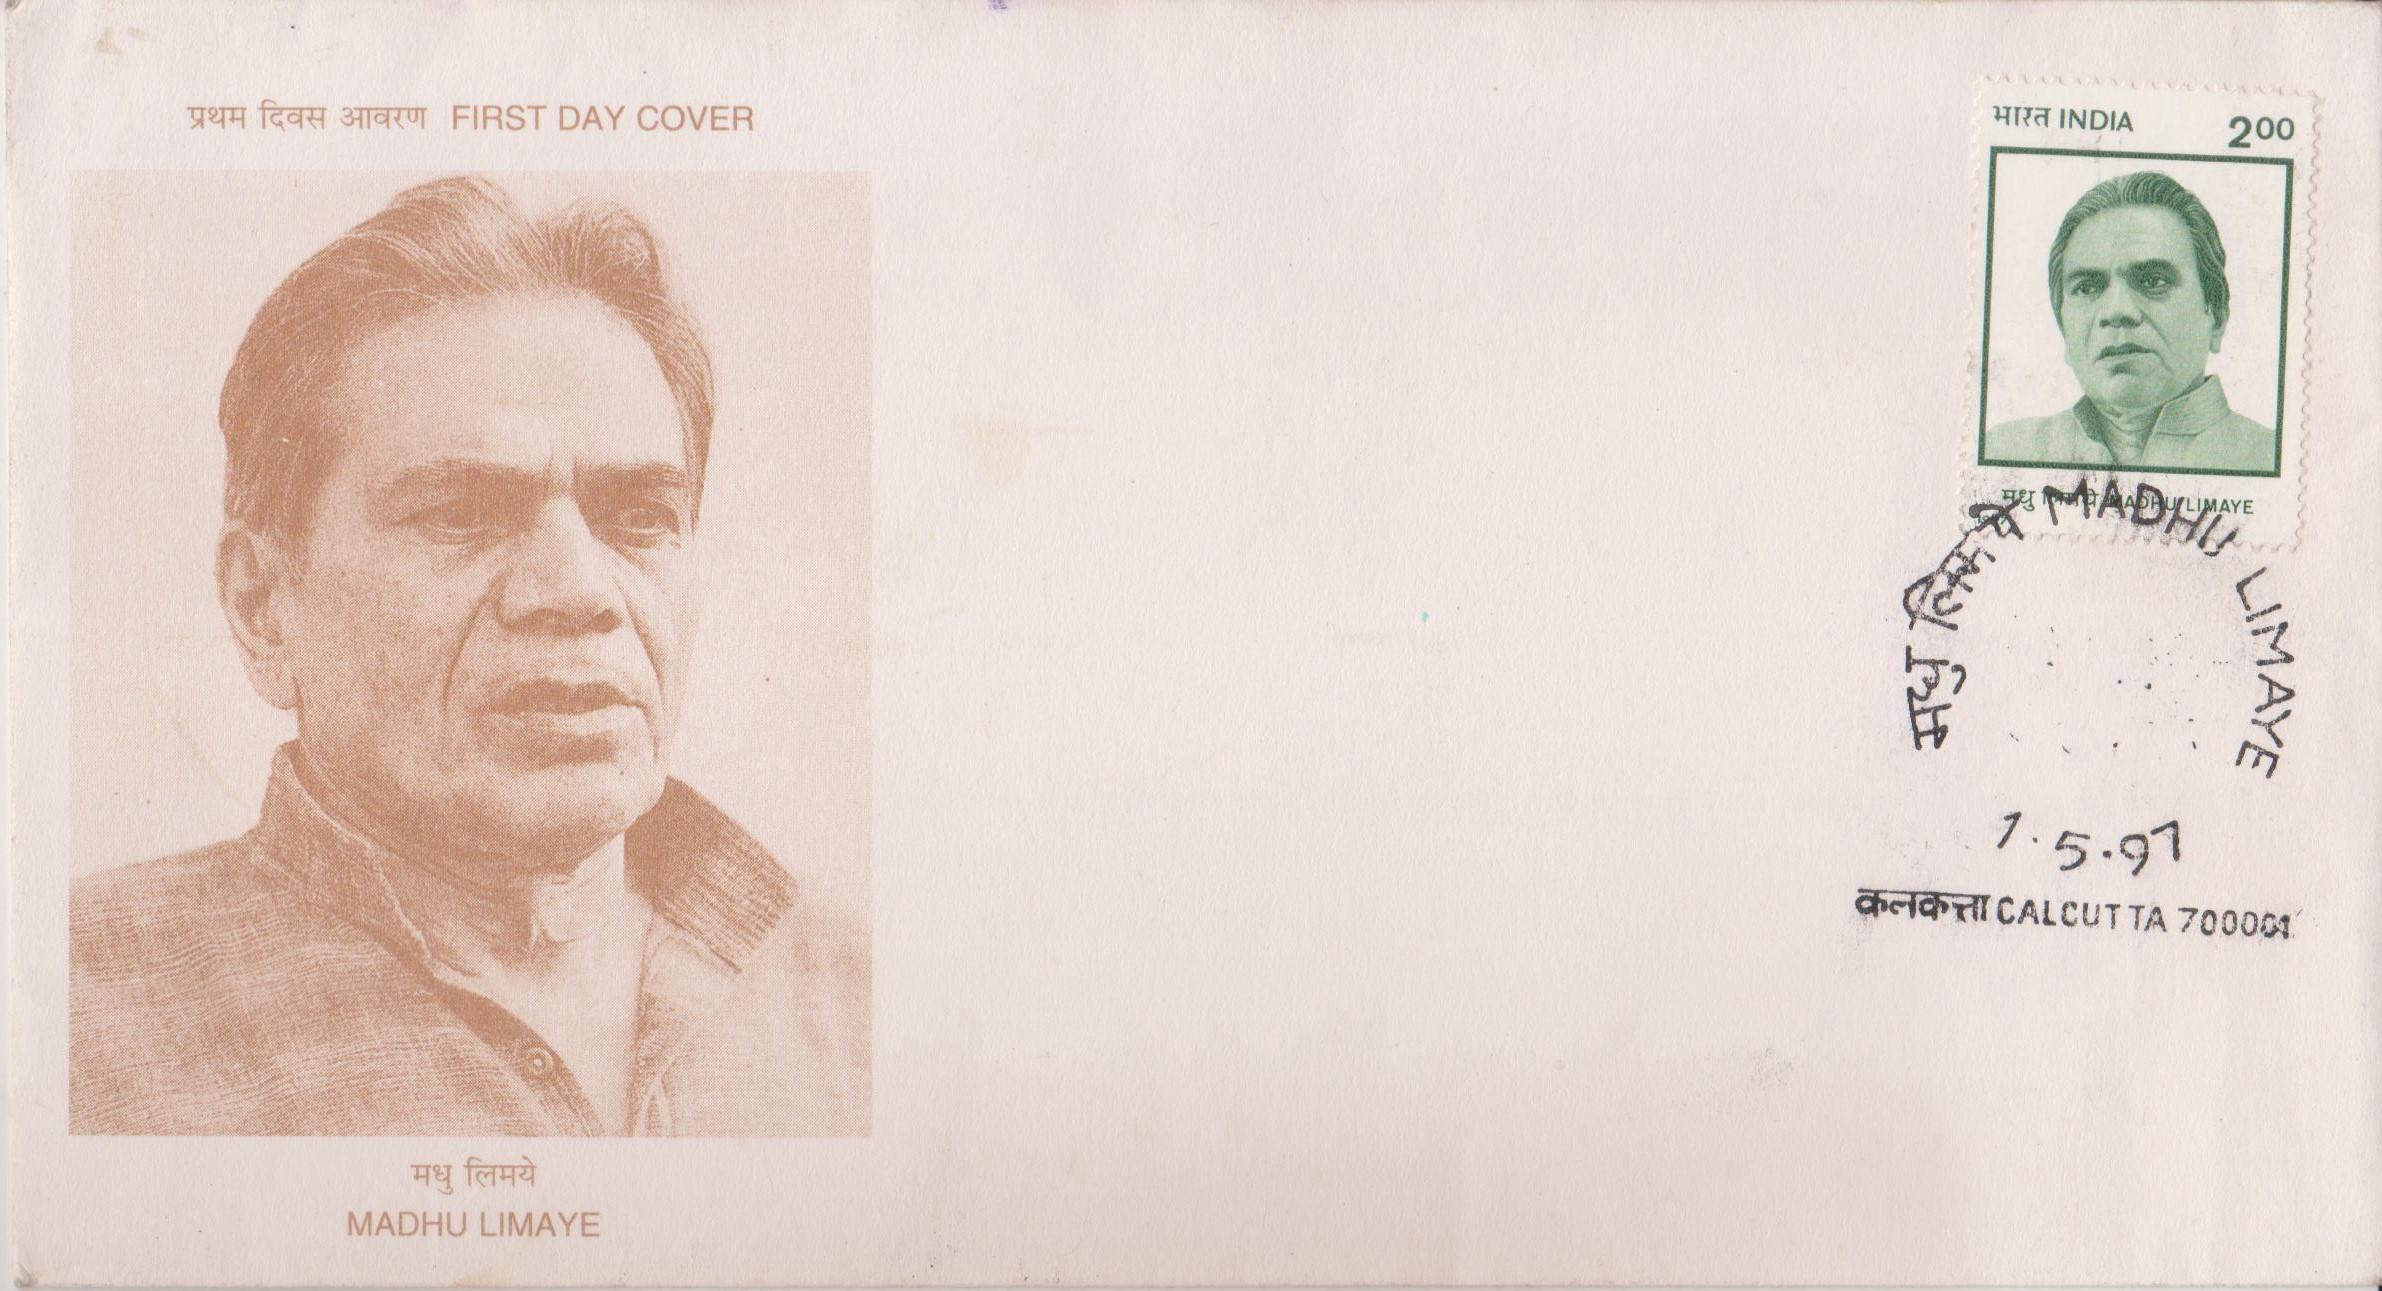 Goa Liberation Movement, Socialist Party